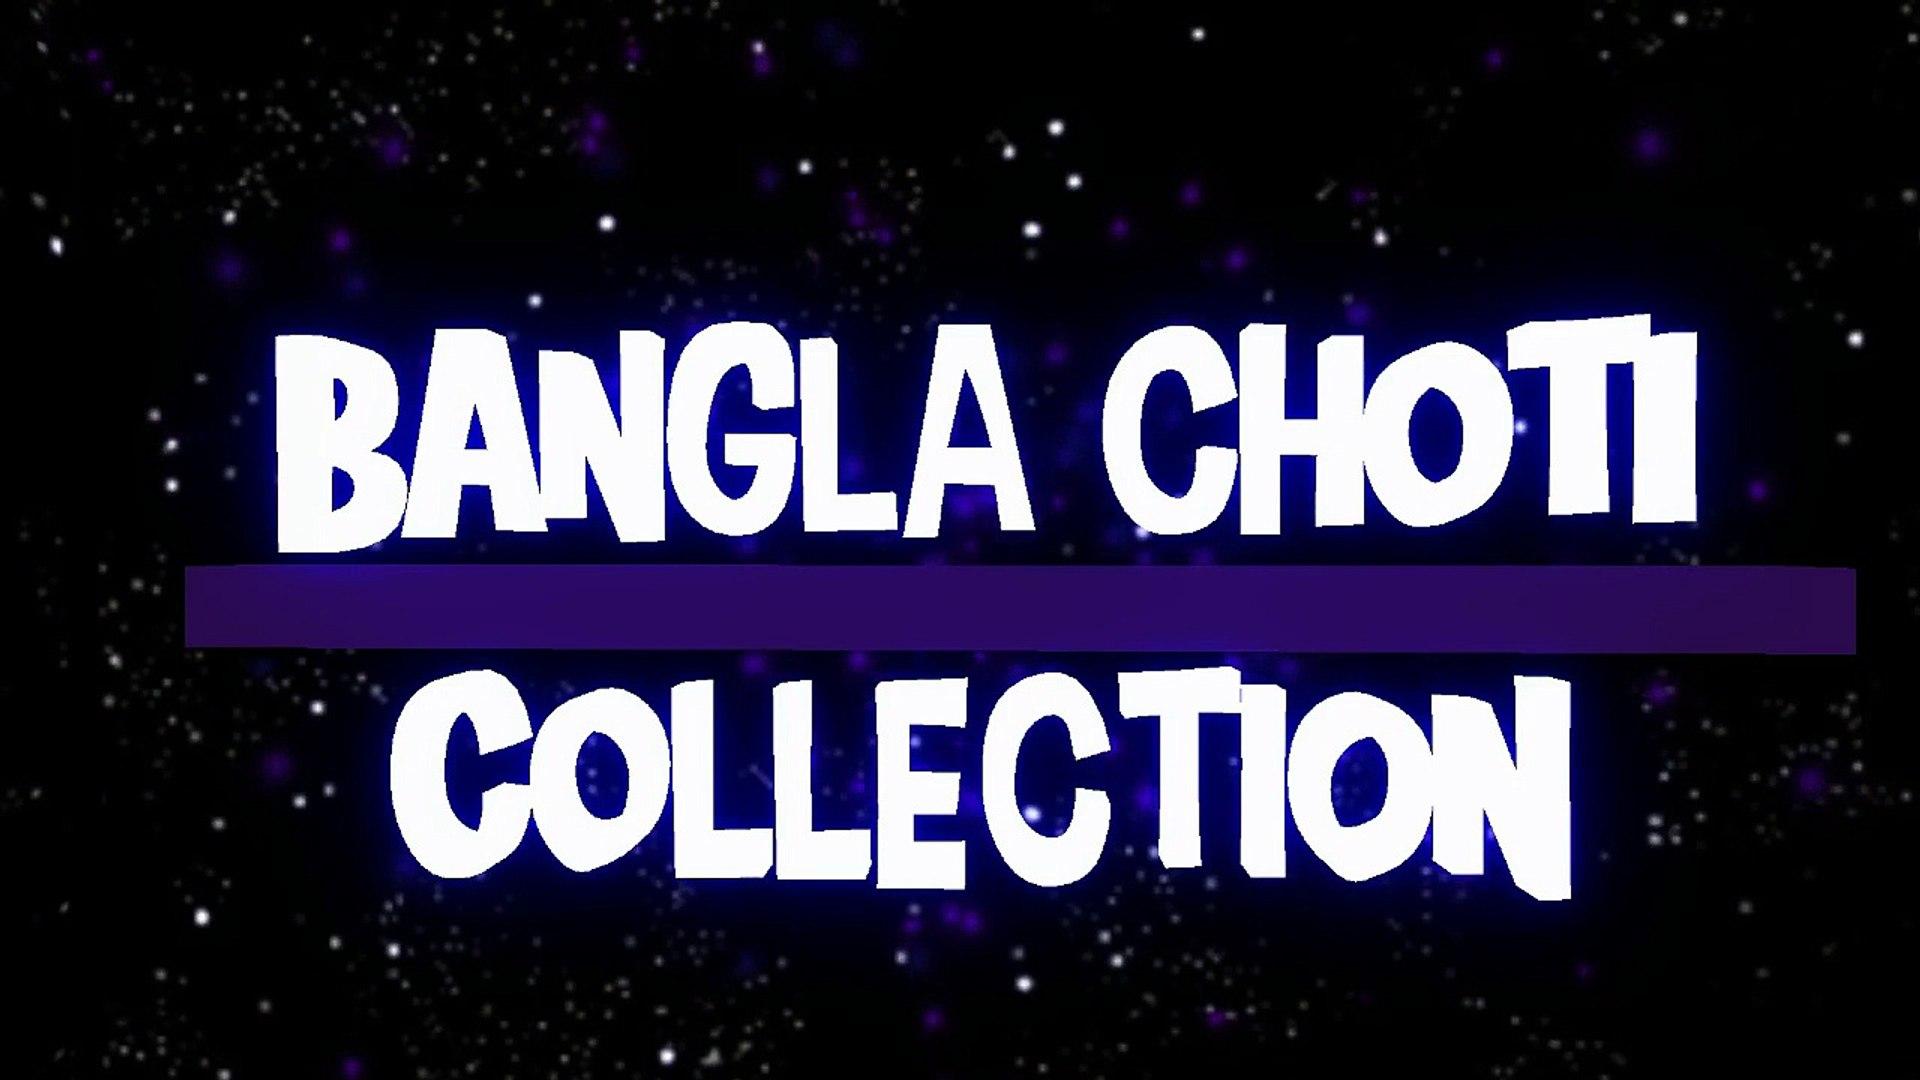 Bangla Choti জিভ দিয়েই চোদা শুরু করলোnew bangla choti collection with sexy female vocal bangla choti collection